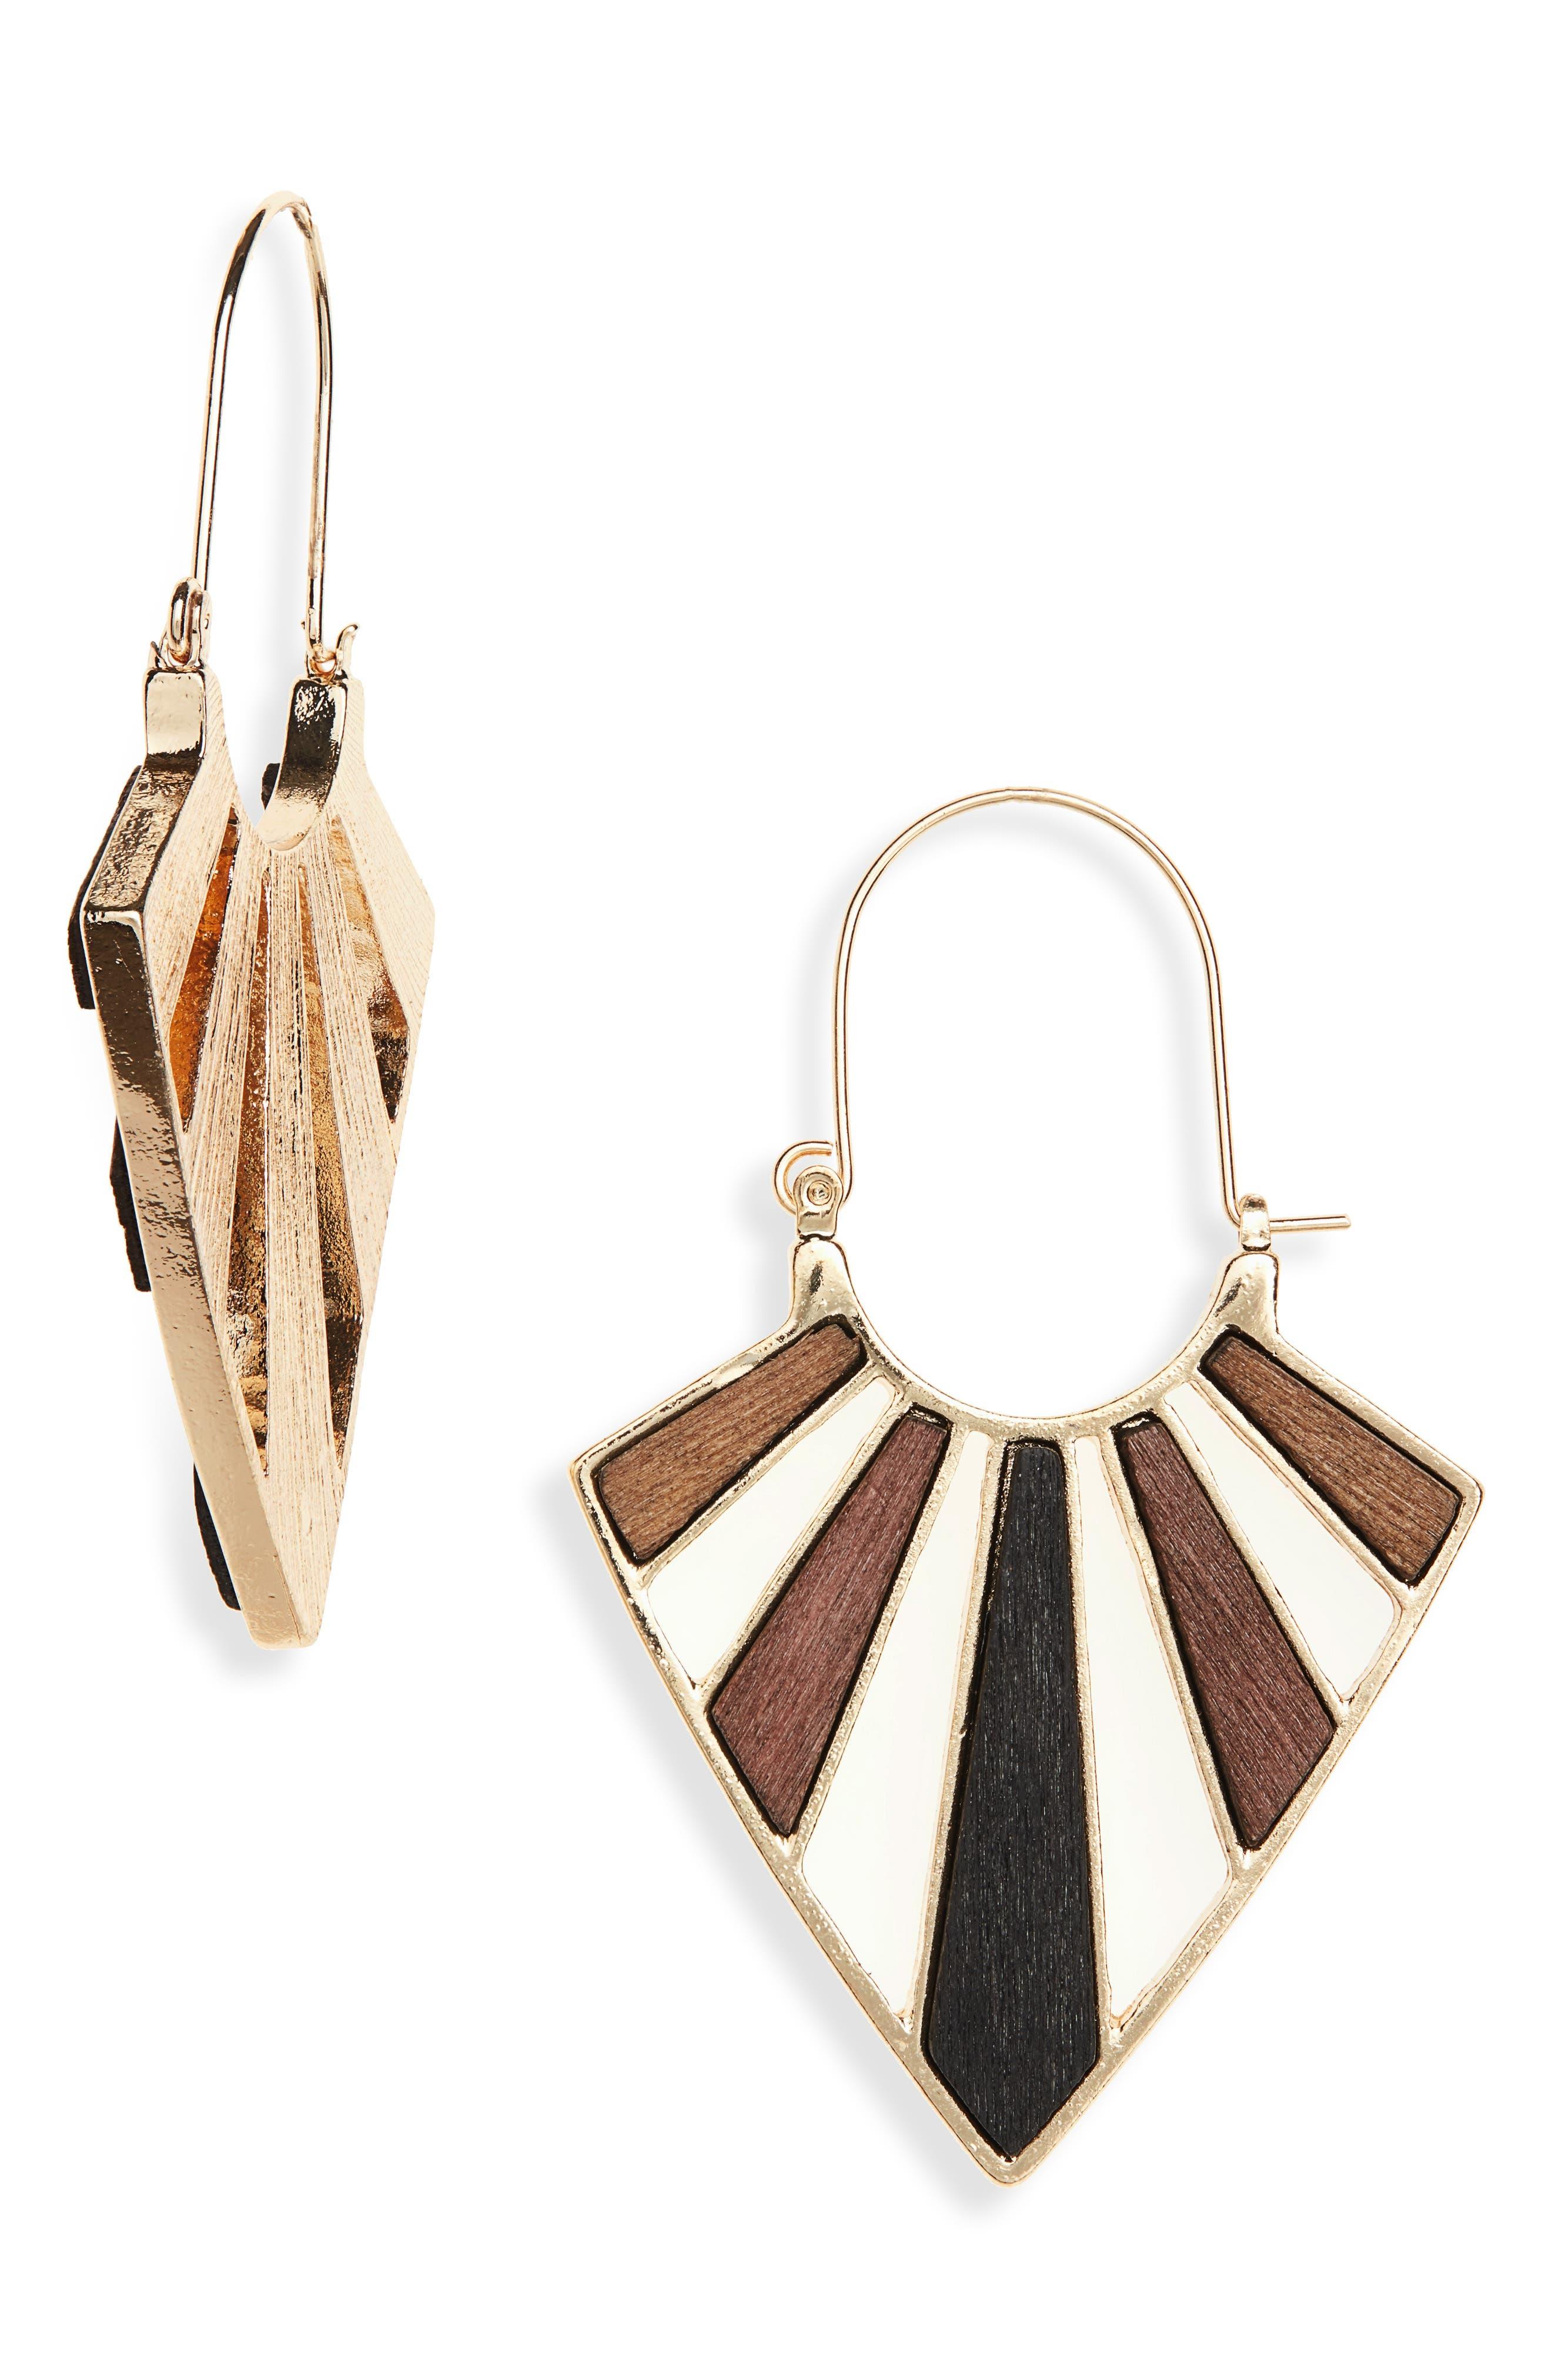 eaf192d07198d4 60s -70s Jewelry – Necklaces, Earrings, Rings, Bracelets Womens Bp. Wood